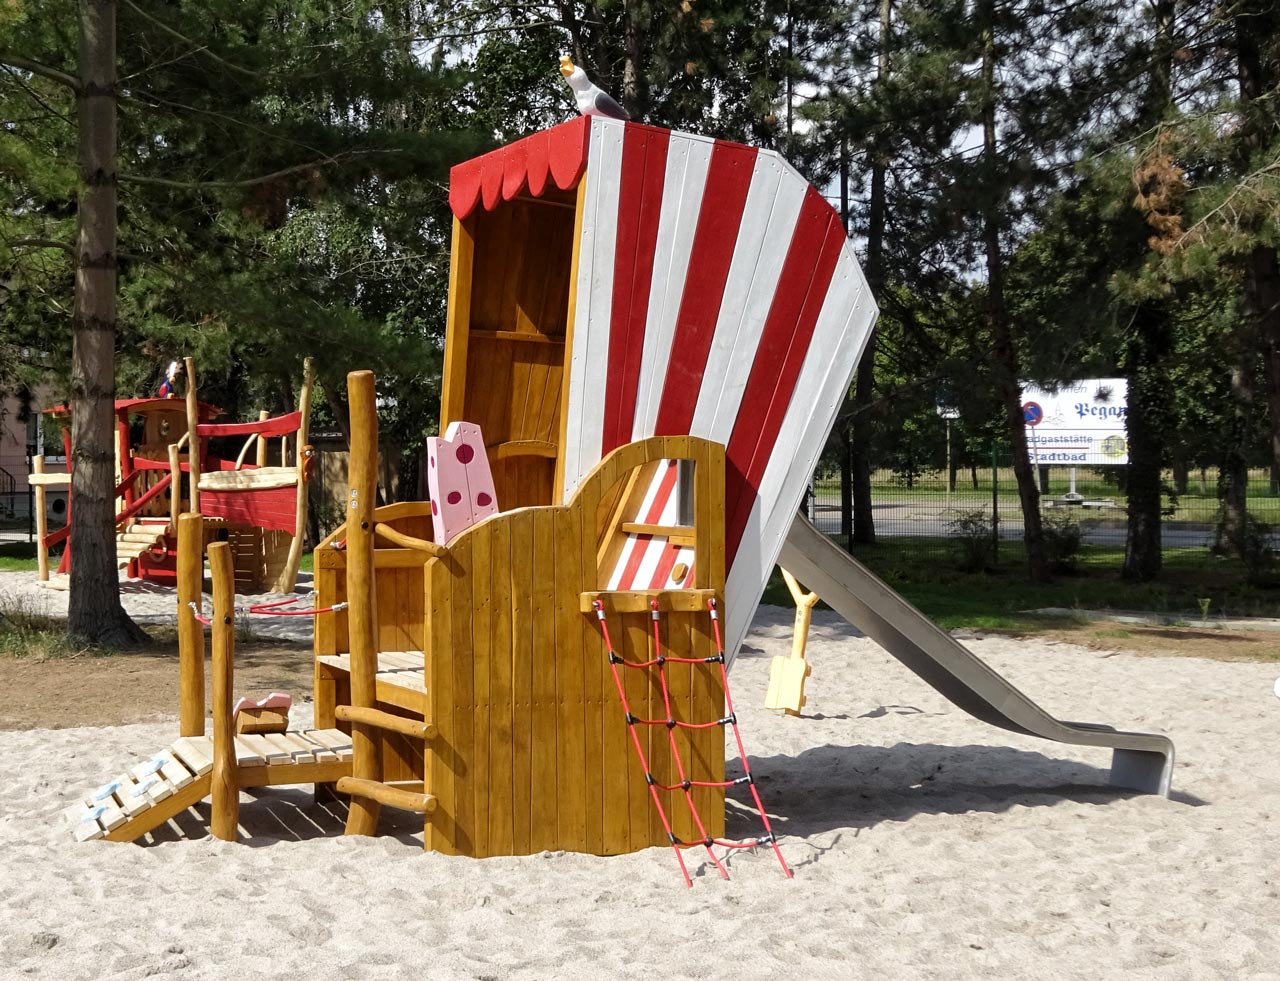 Freibad Pegau, Themenspielplatz Strandkorb